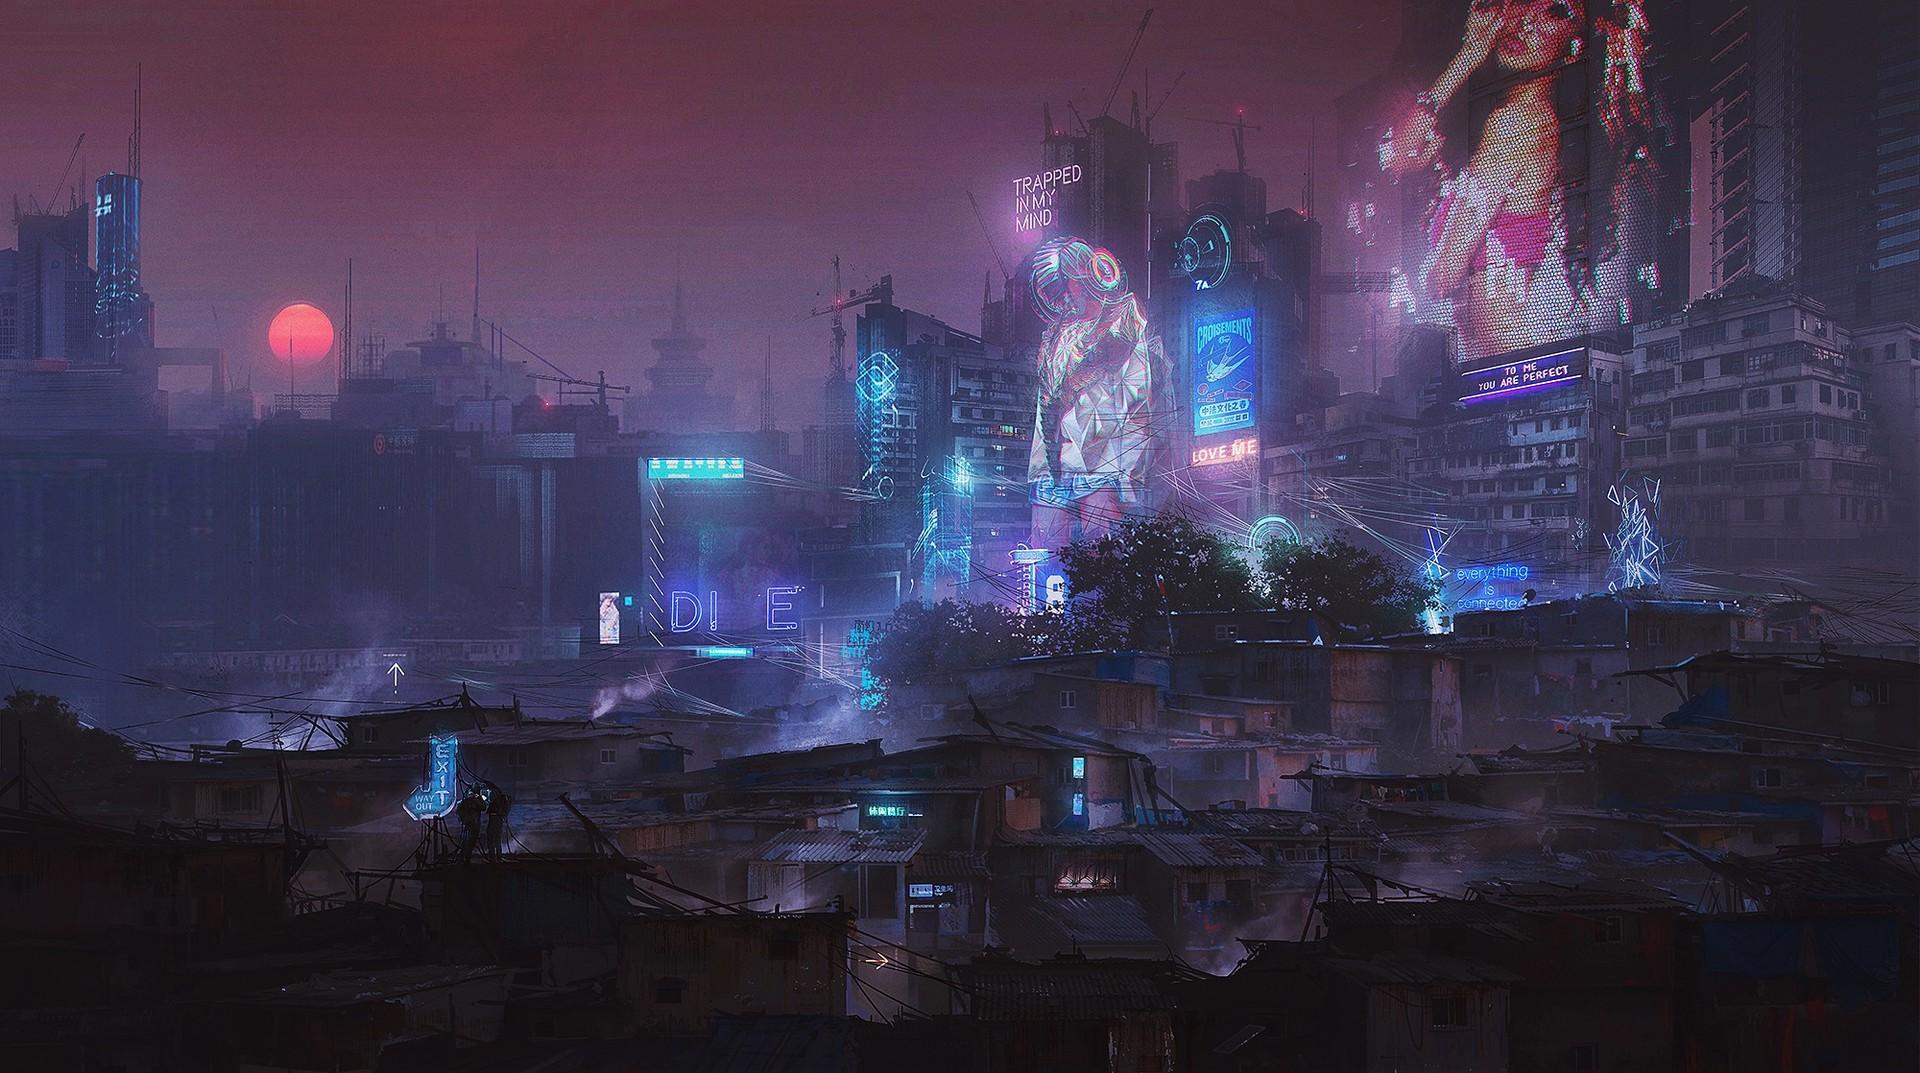 donglu-yu-cyberpunk-rooftop-view-small.j